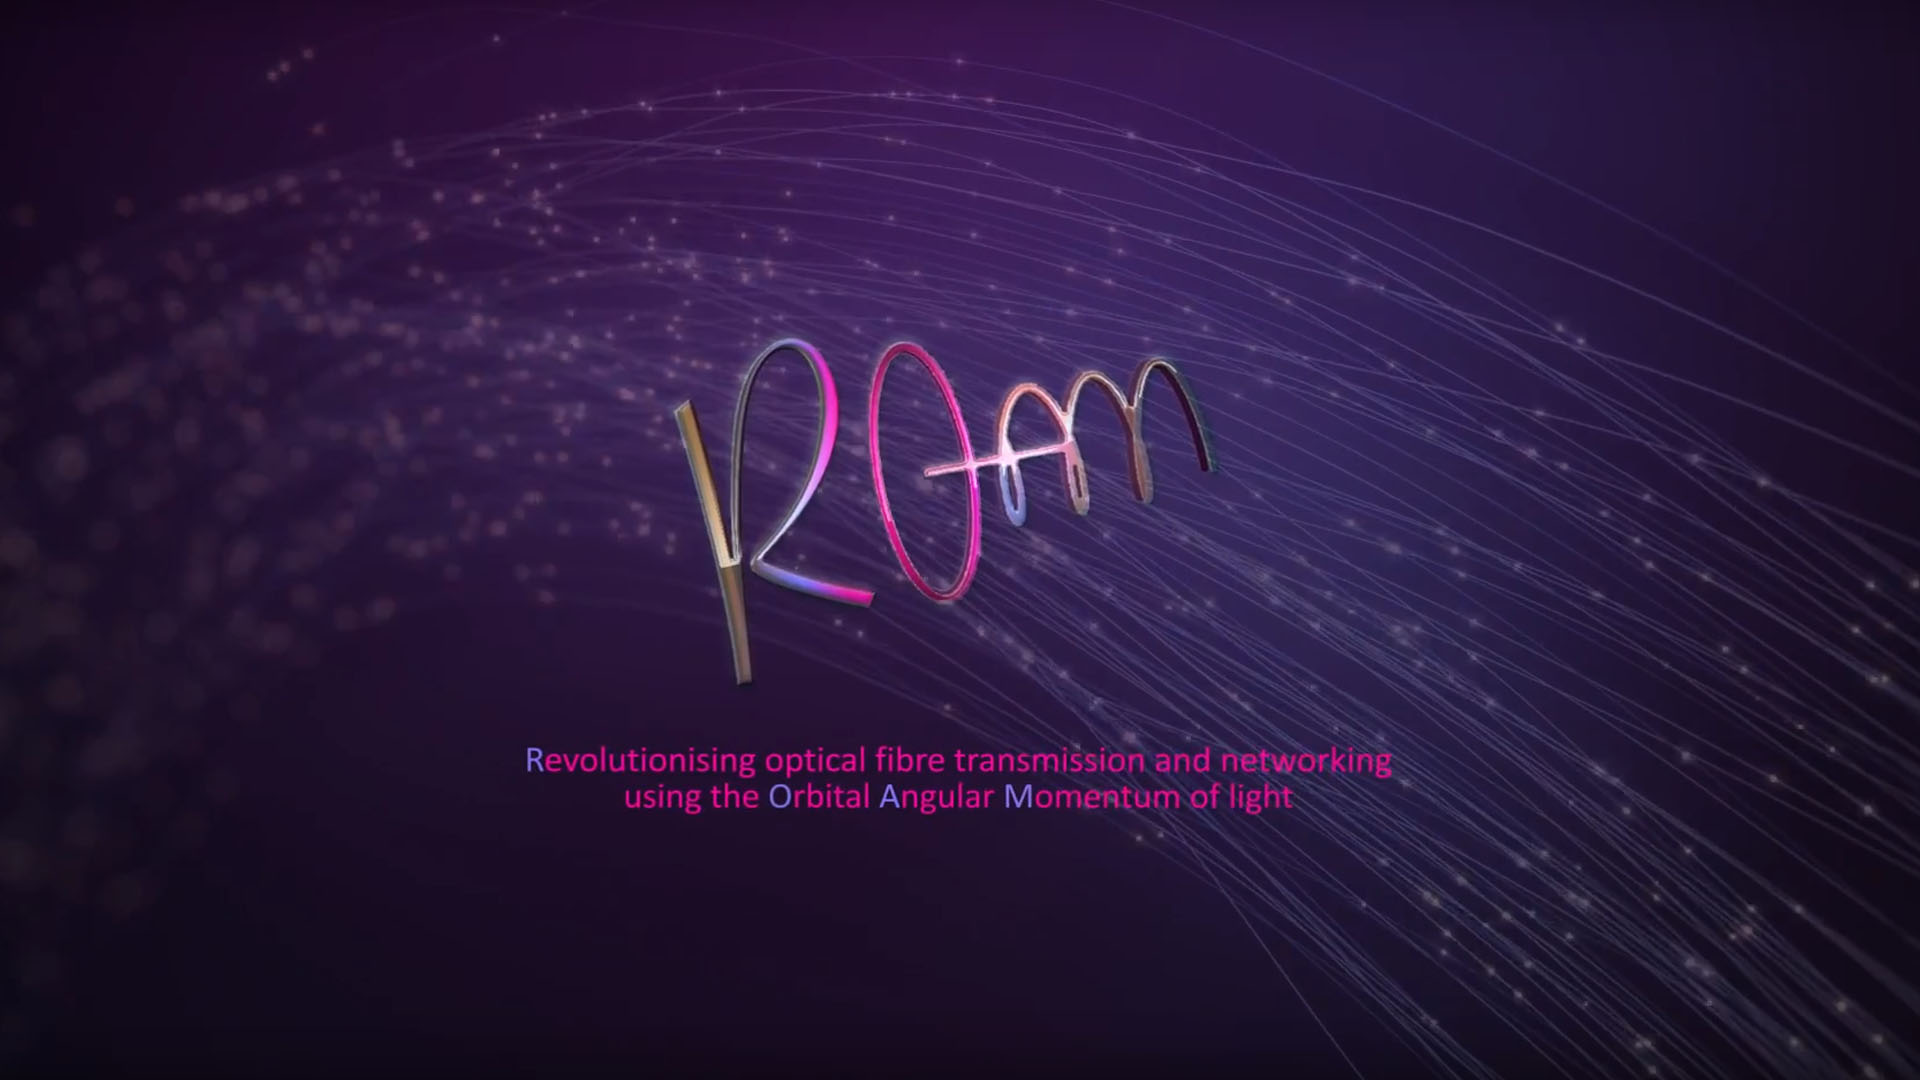 Wideo: promocja projektu ROAM